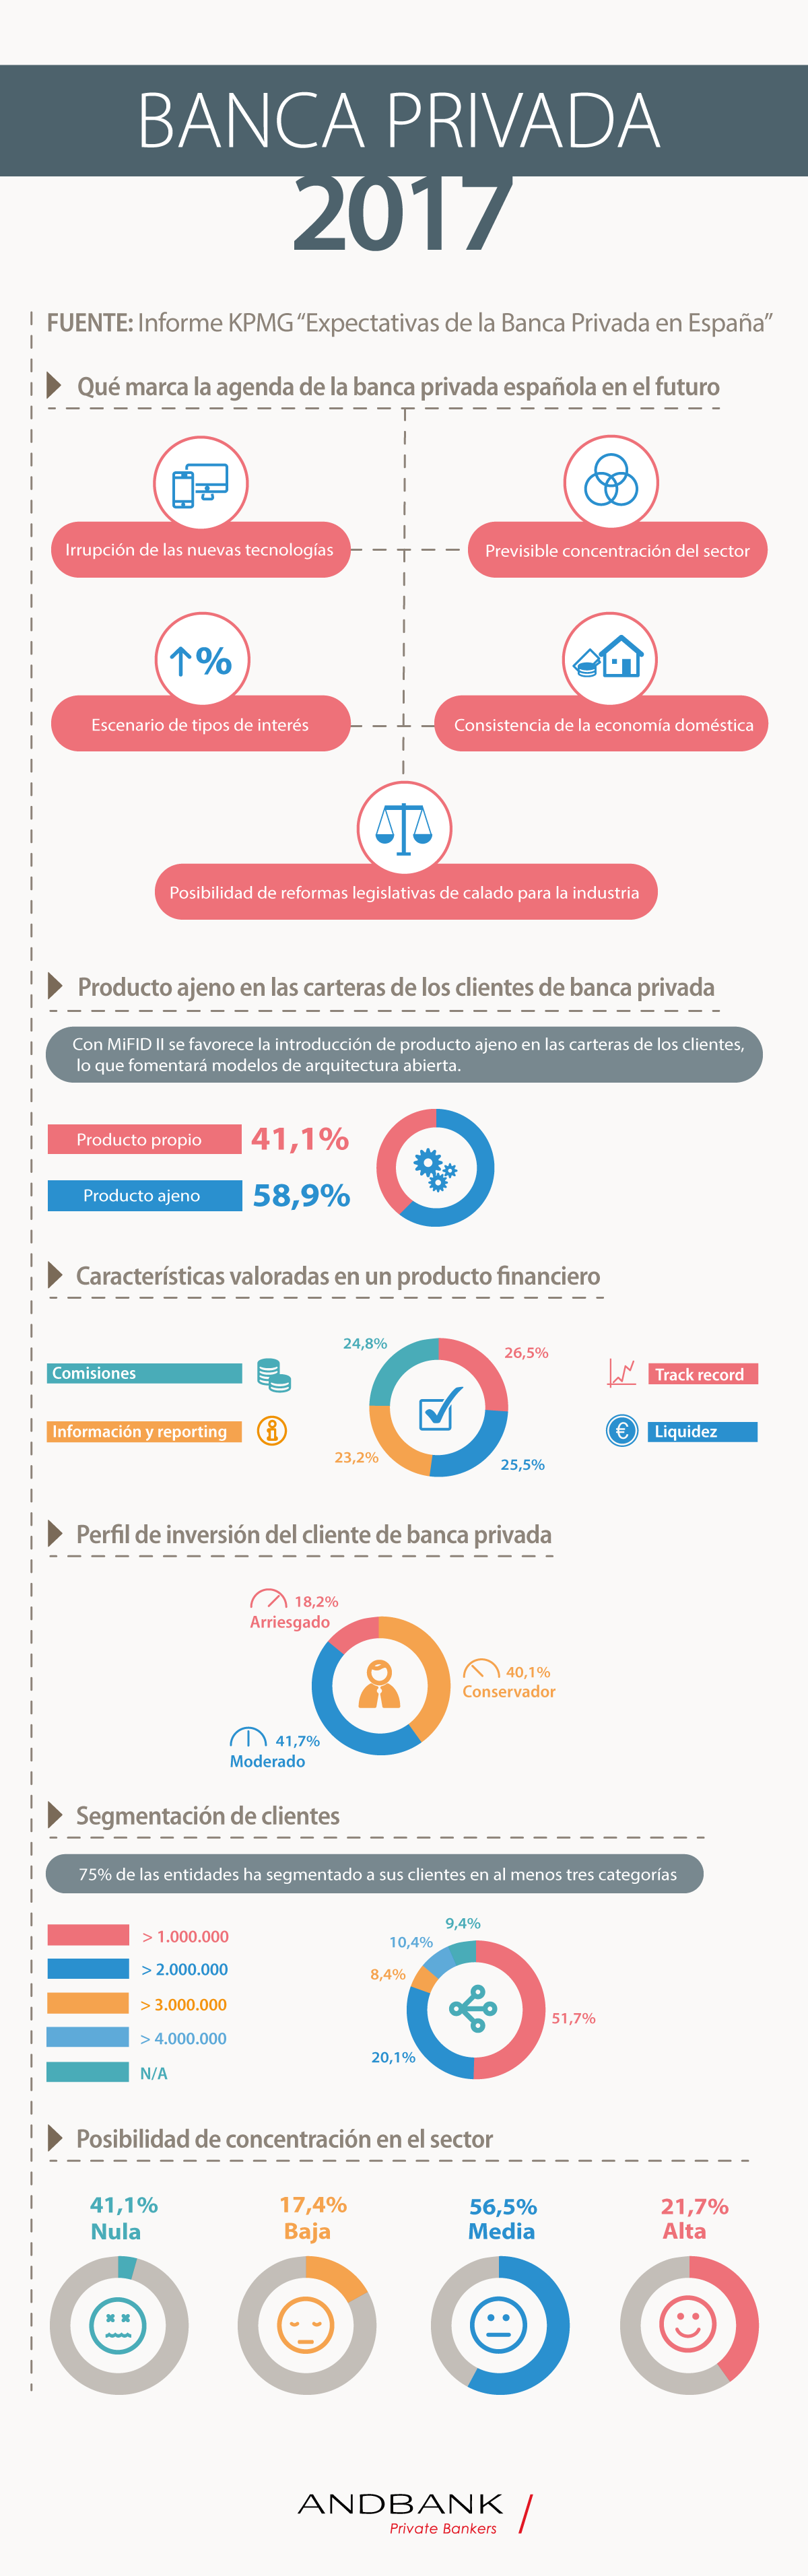 Andbank_infografia_banca_privada